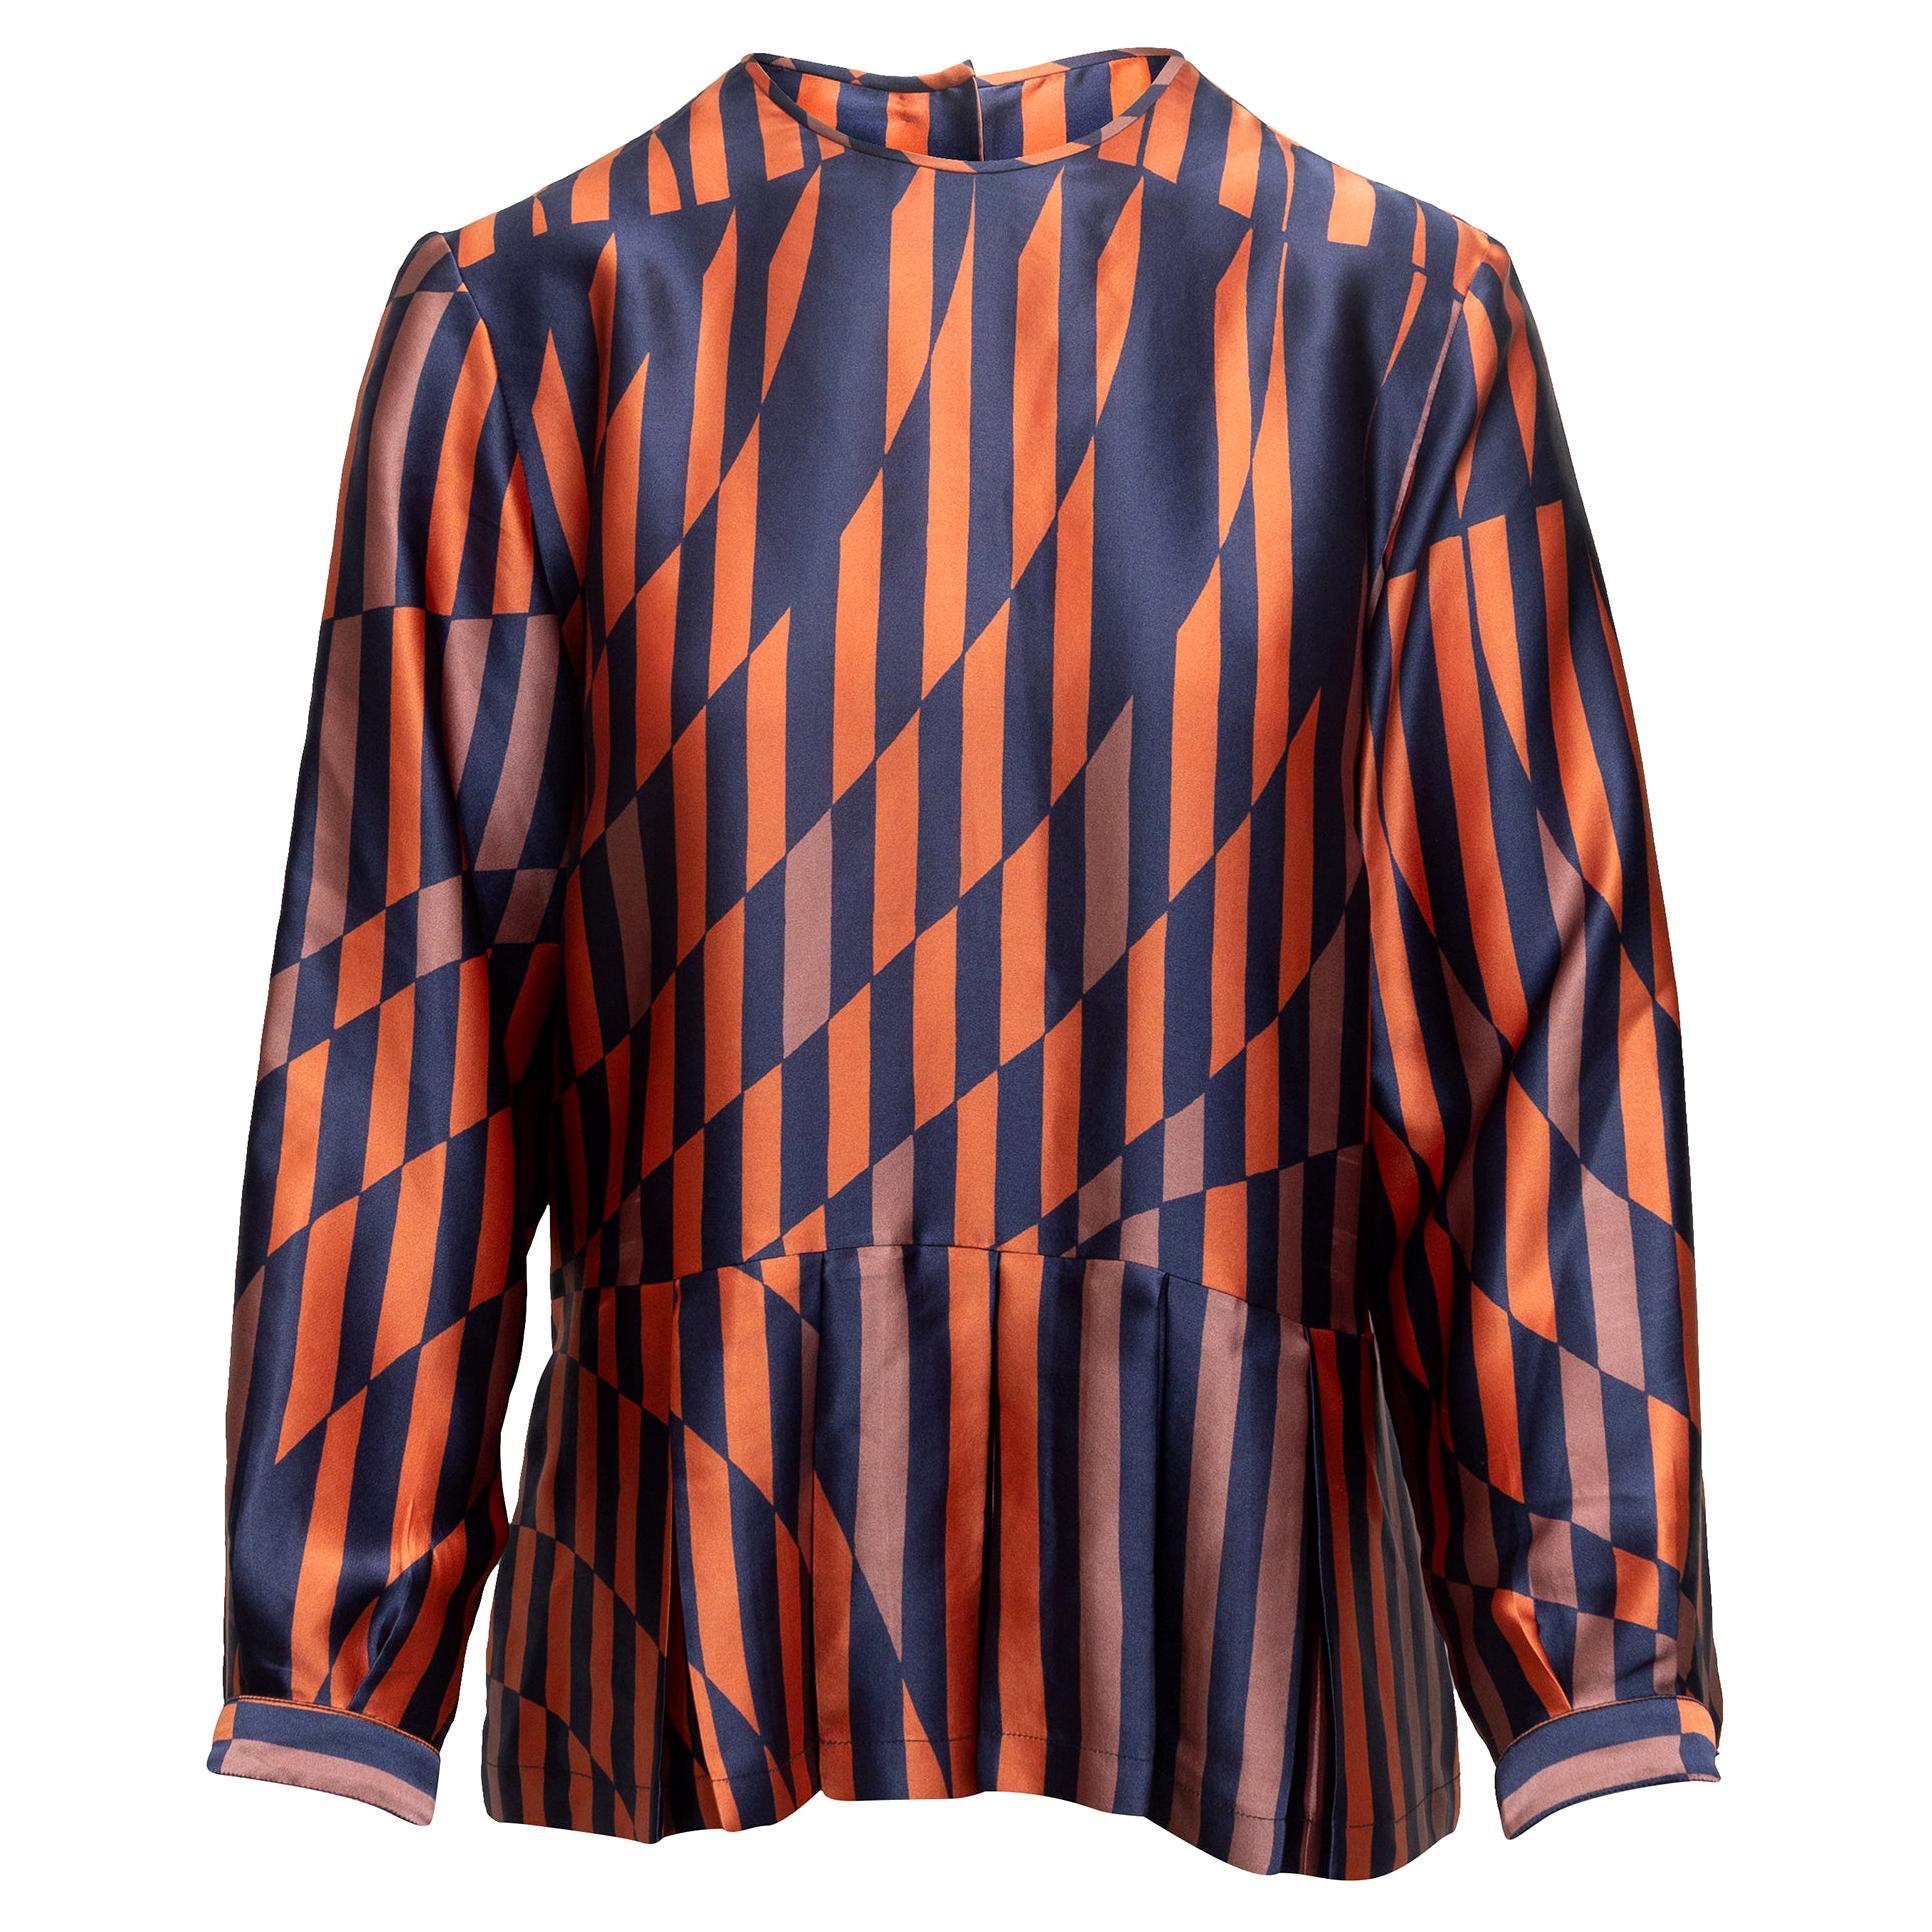 Dries Van Noten Orange & Multicolor Silk Striped Top